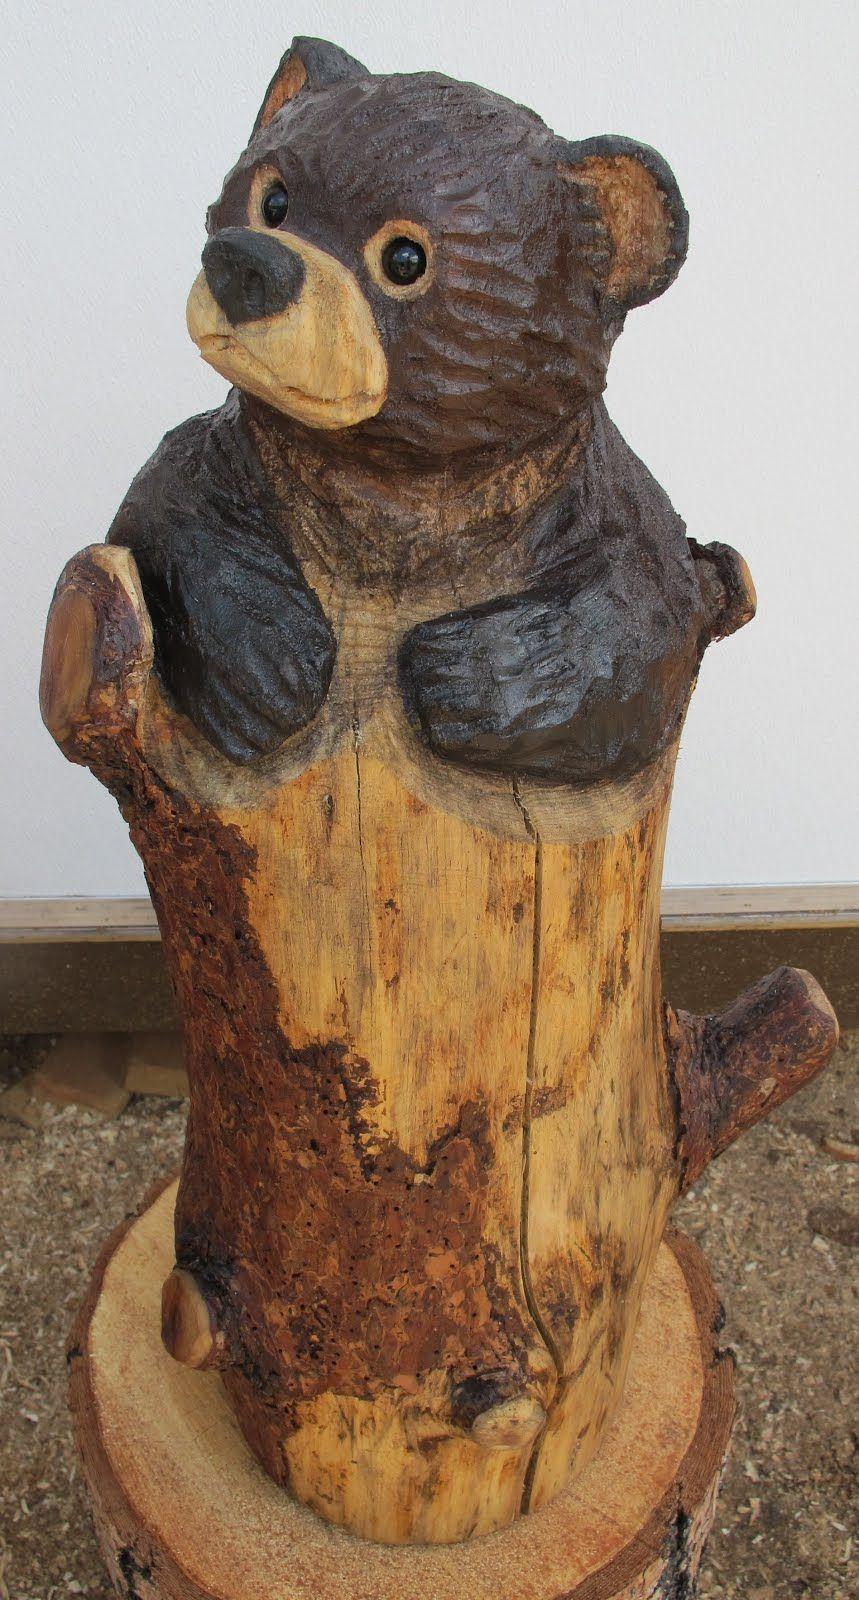 Little bear in stump c x david v gonzales